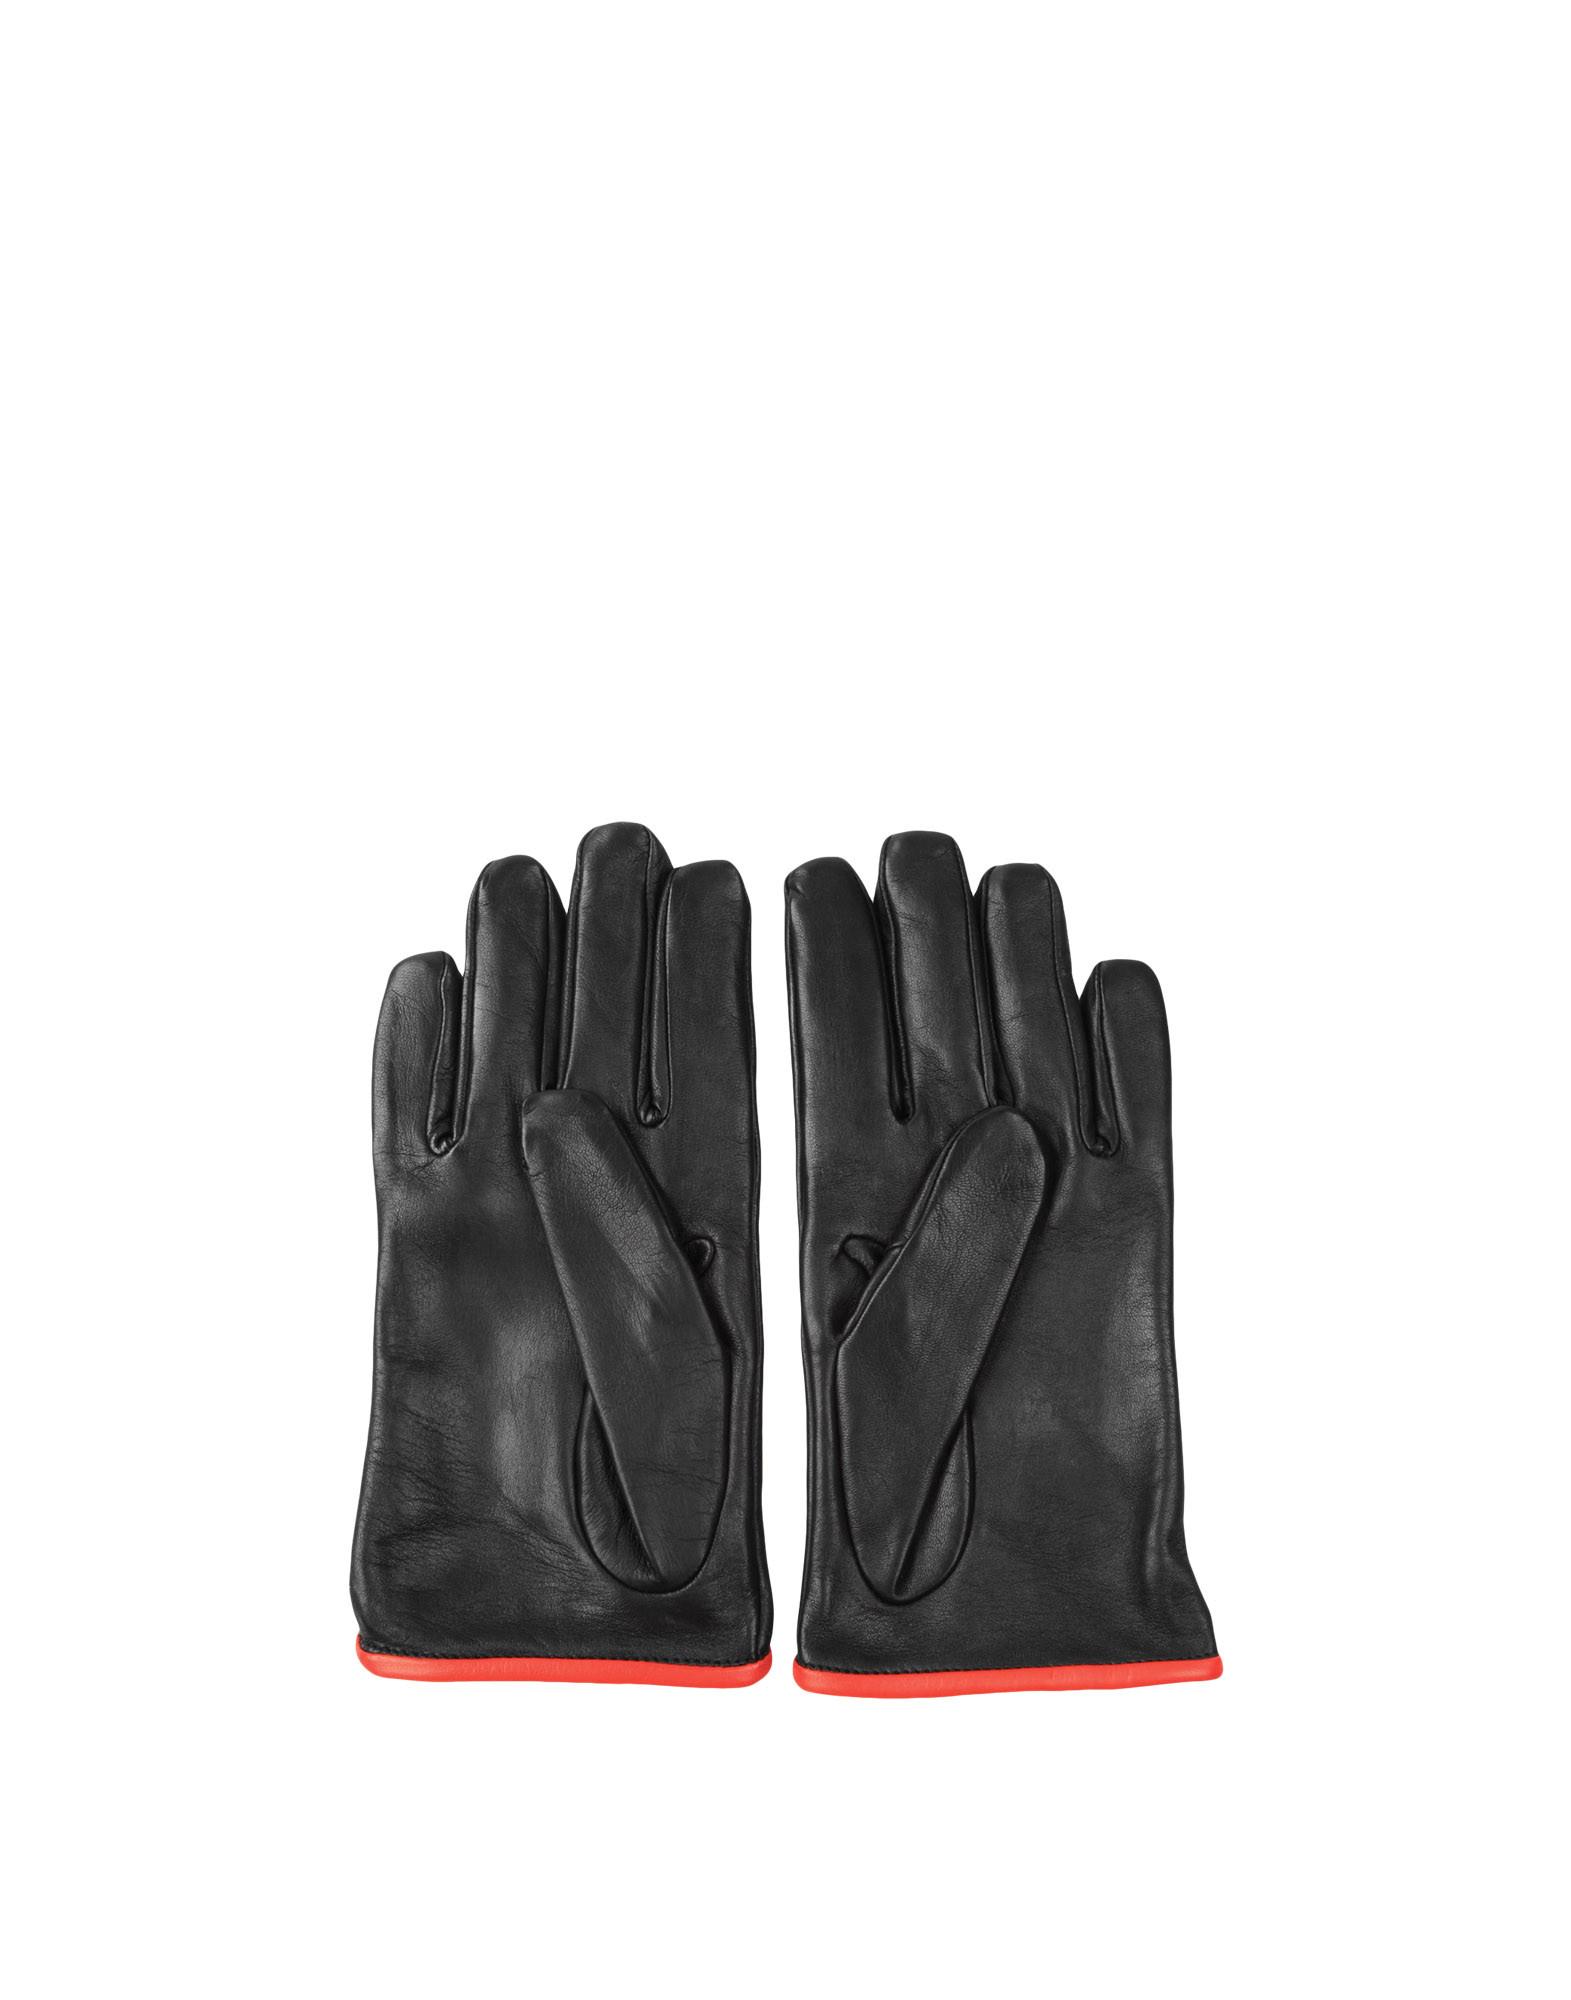 Handschuhe - JIL SANDER NAVY Online Store